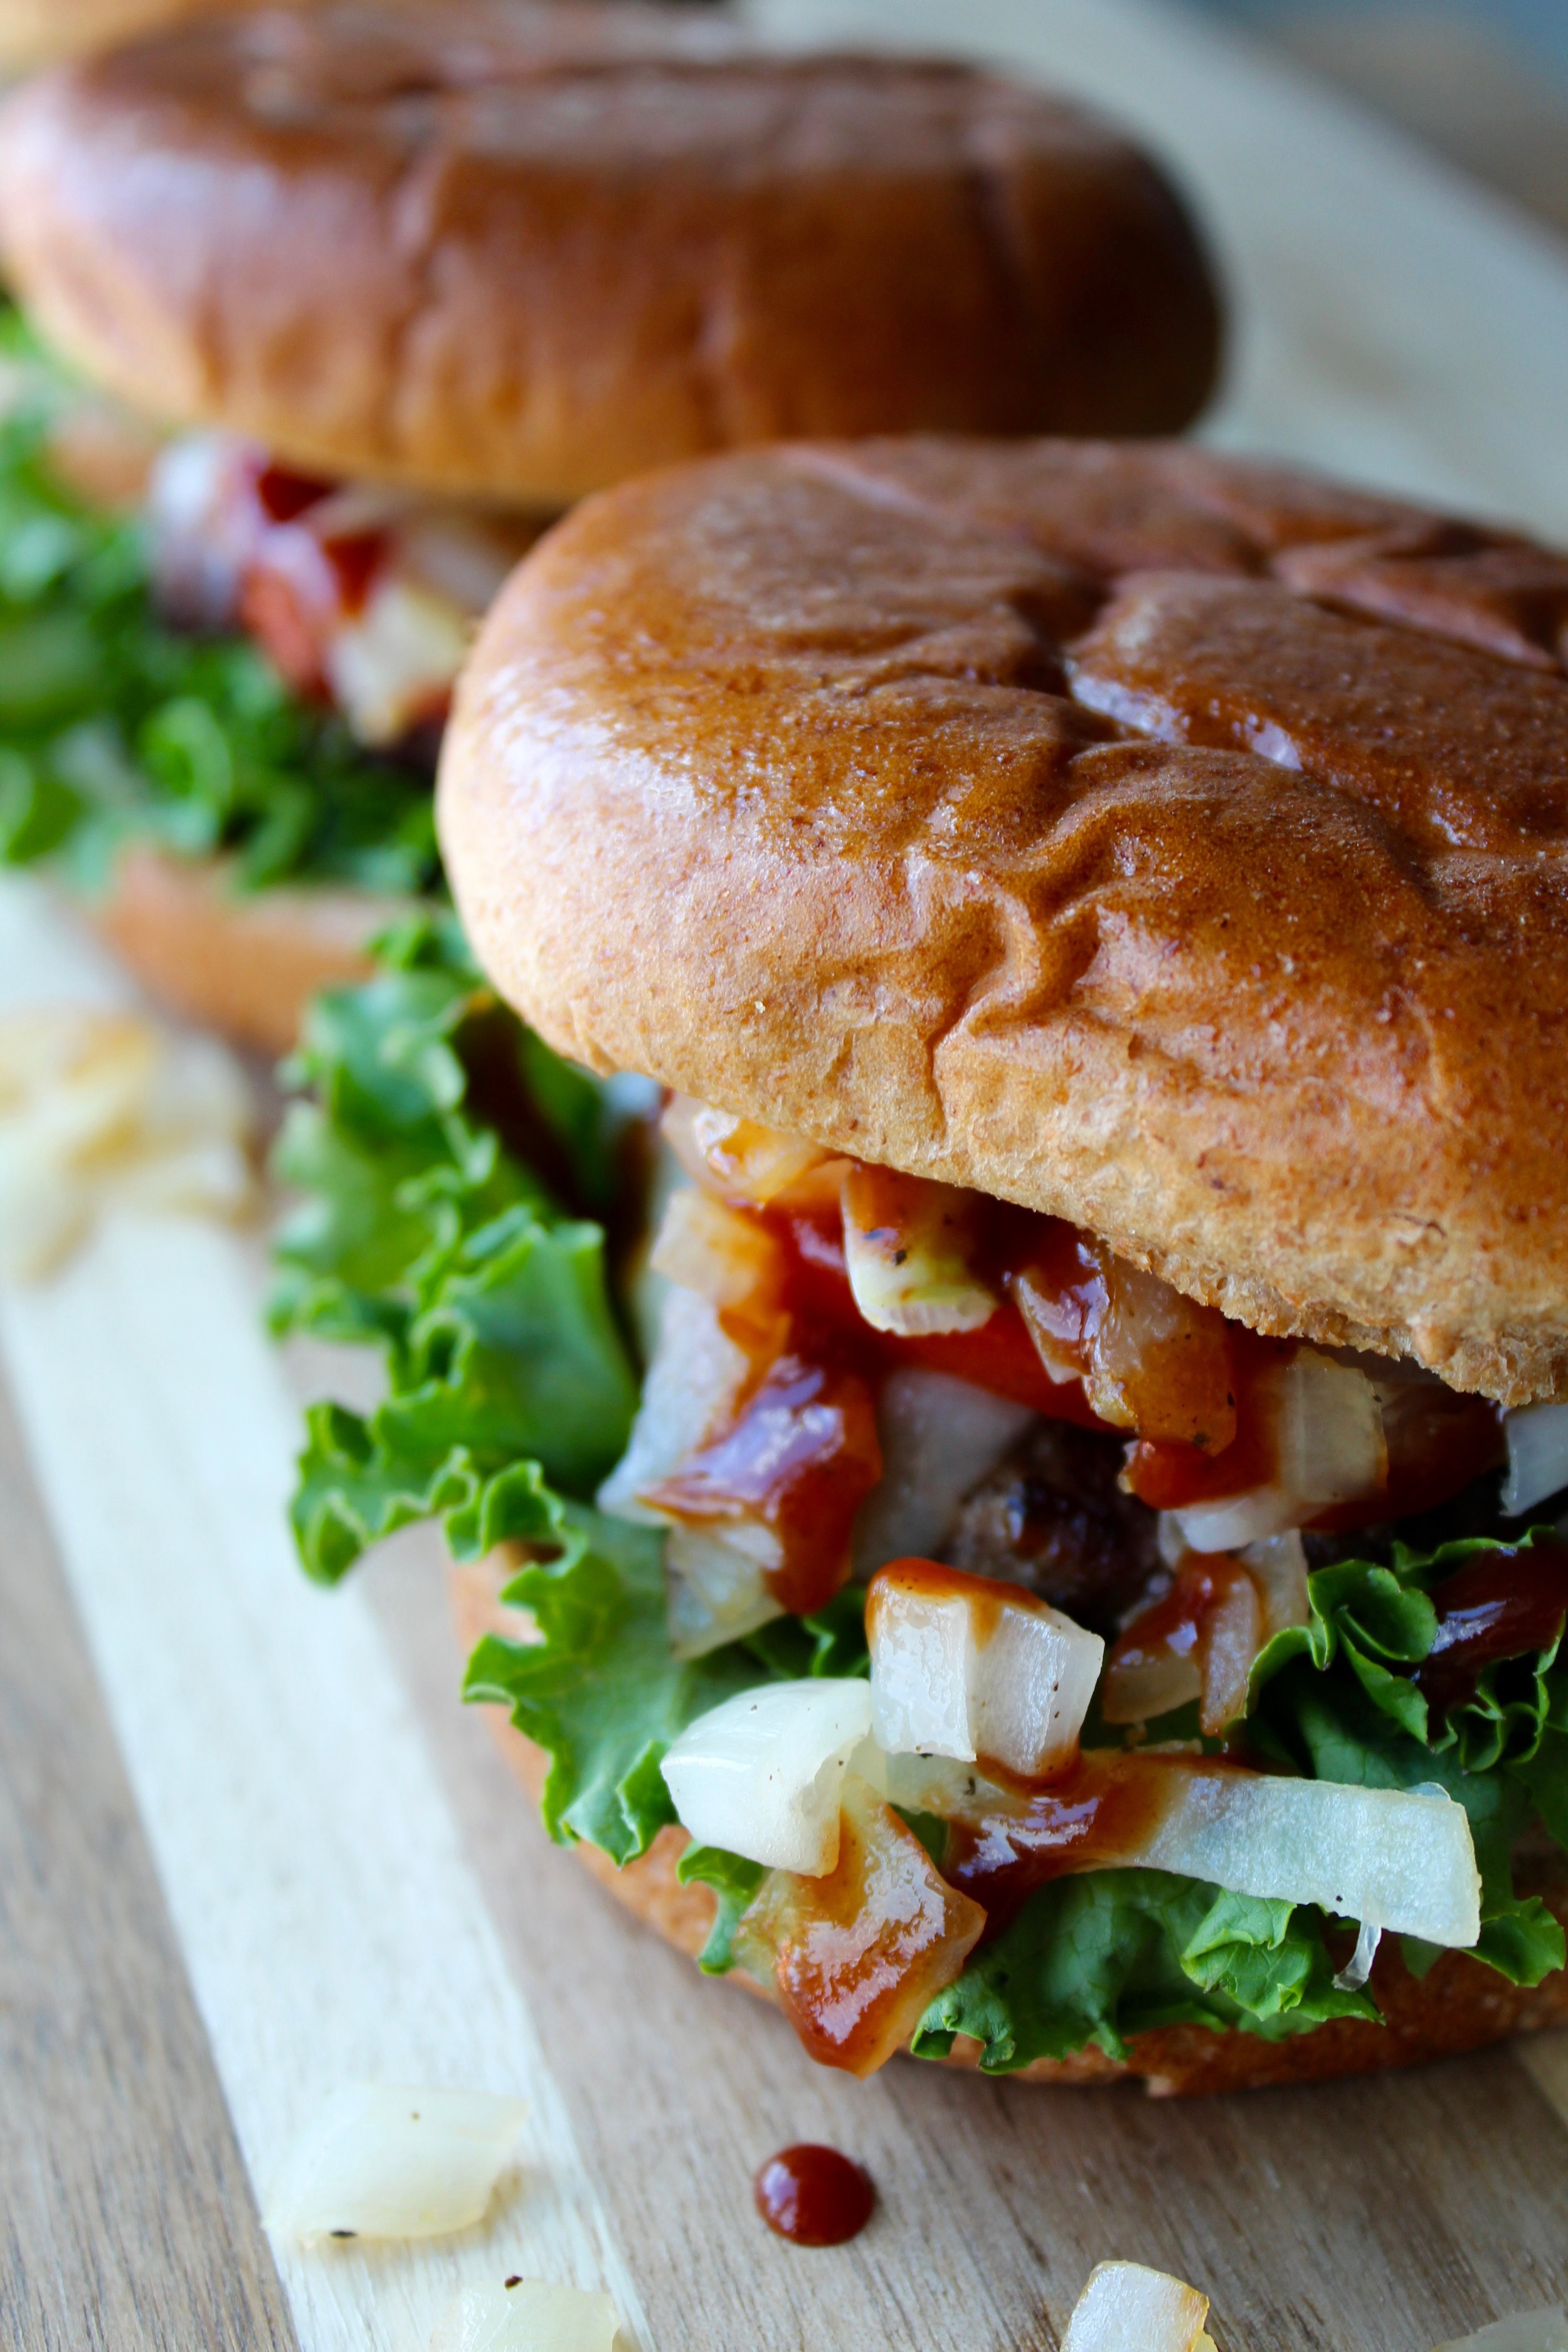 BBQ Bison Burger - Makes 4 servings345 calories / 12F / 33C / 26P